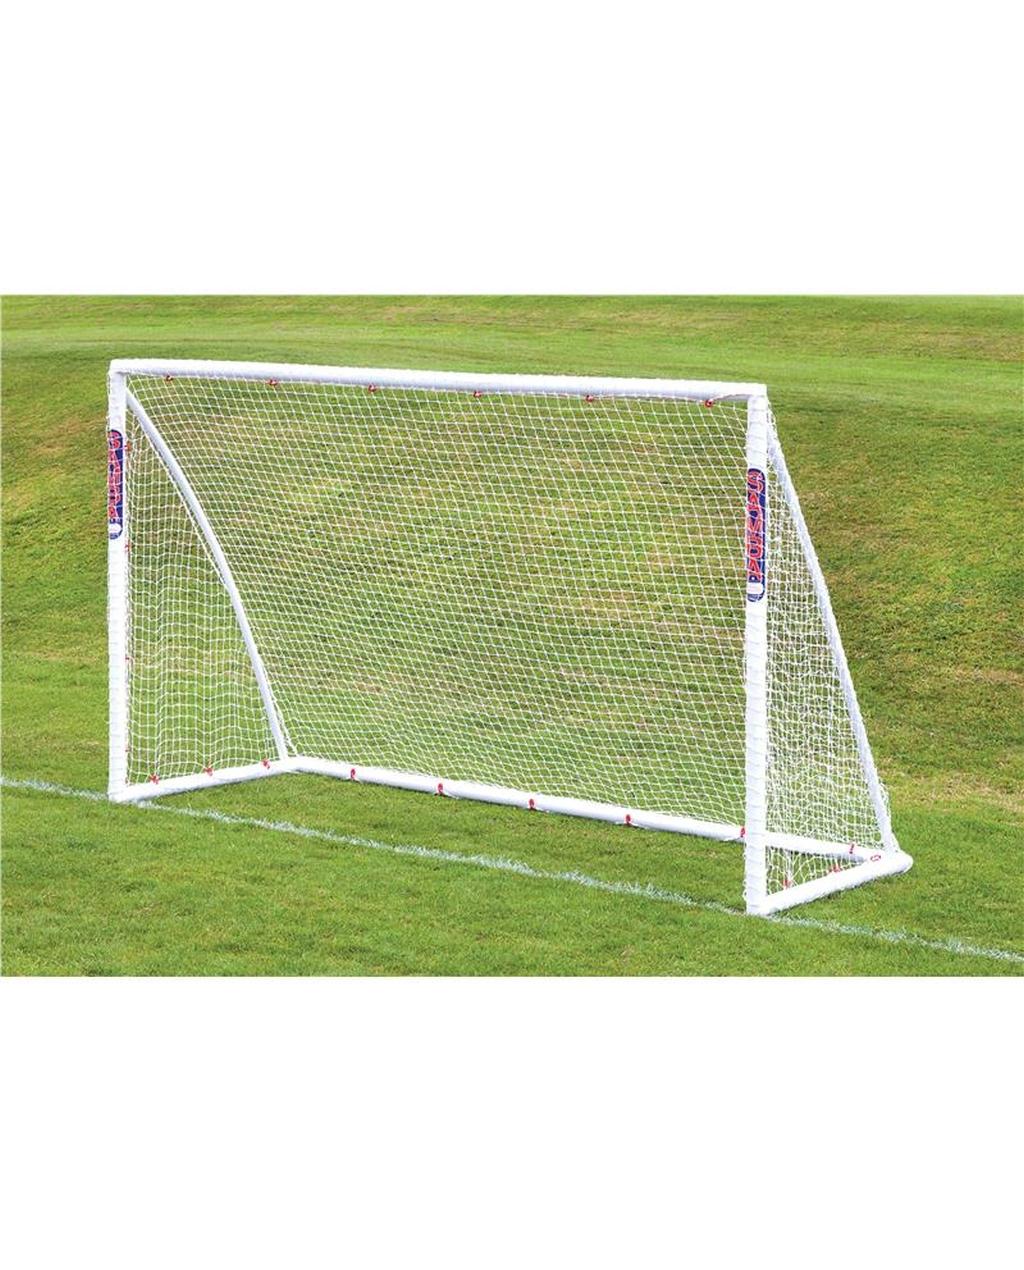 Samba Hockey Goal